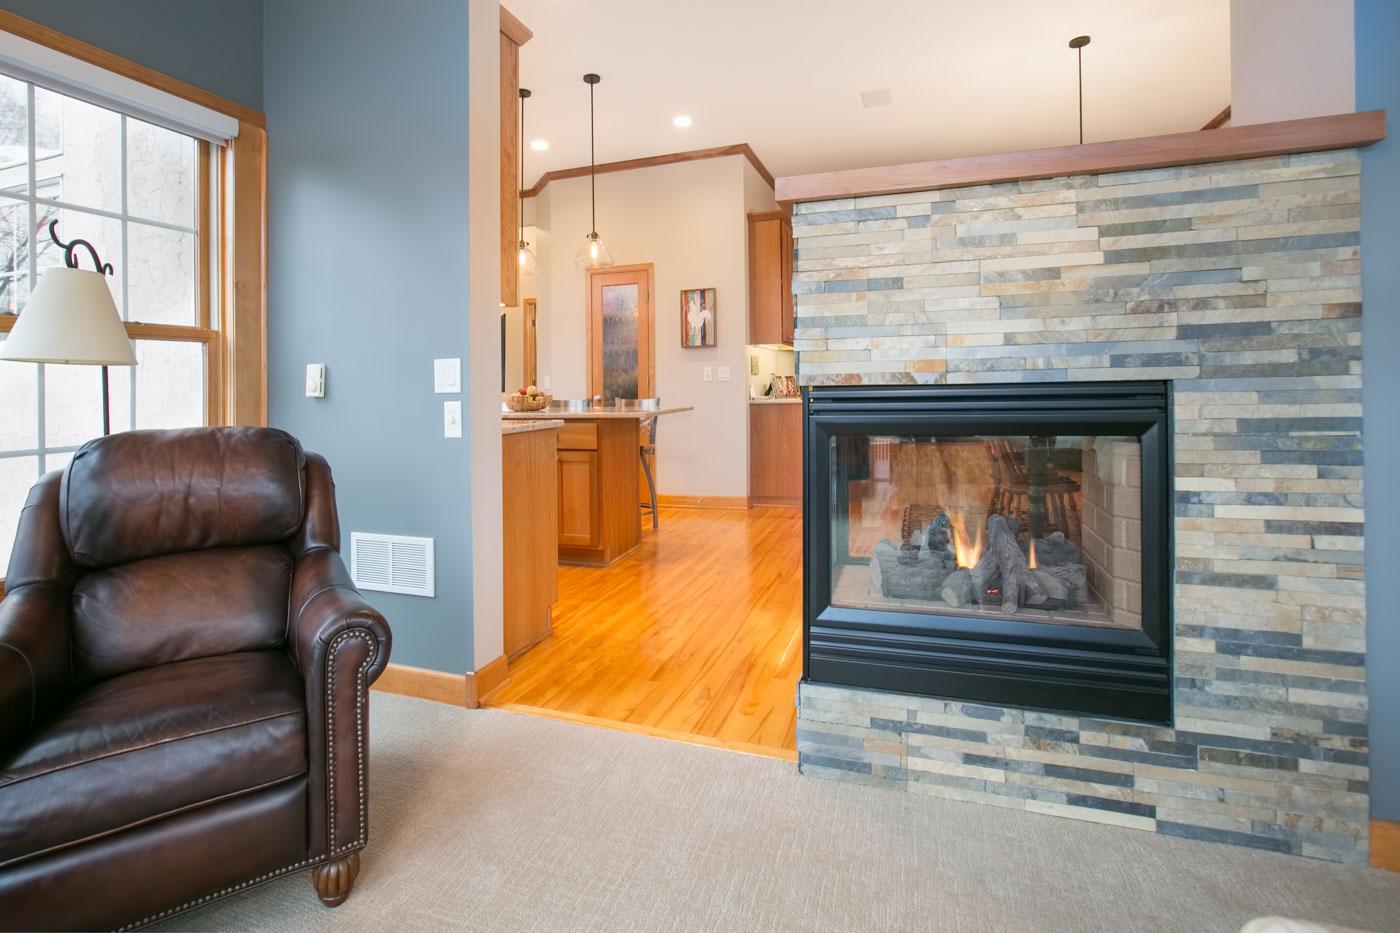 interior home remodeling portfolio james barton design build minneapolis home remodeling and renovation company